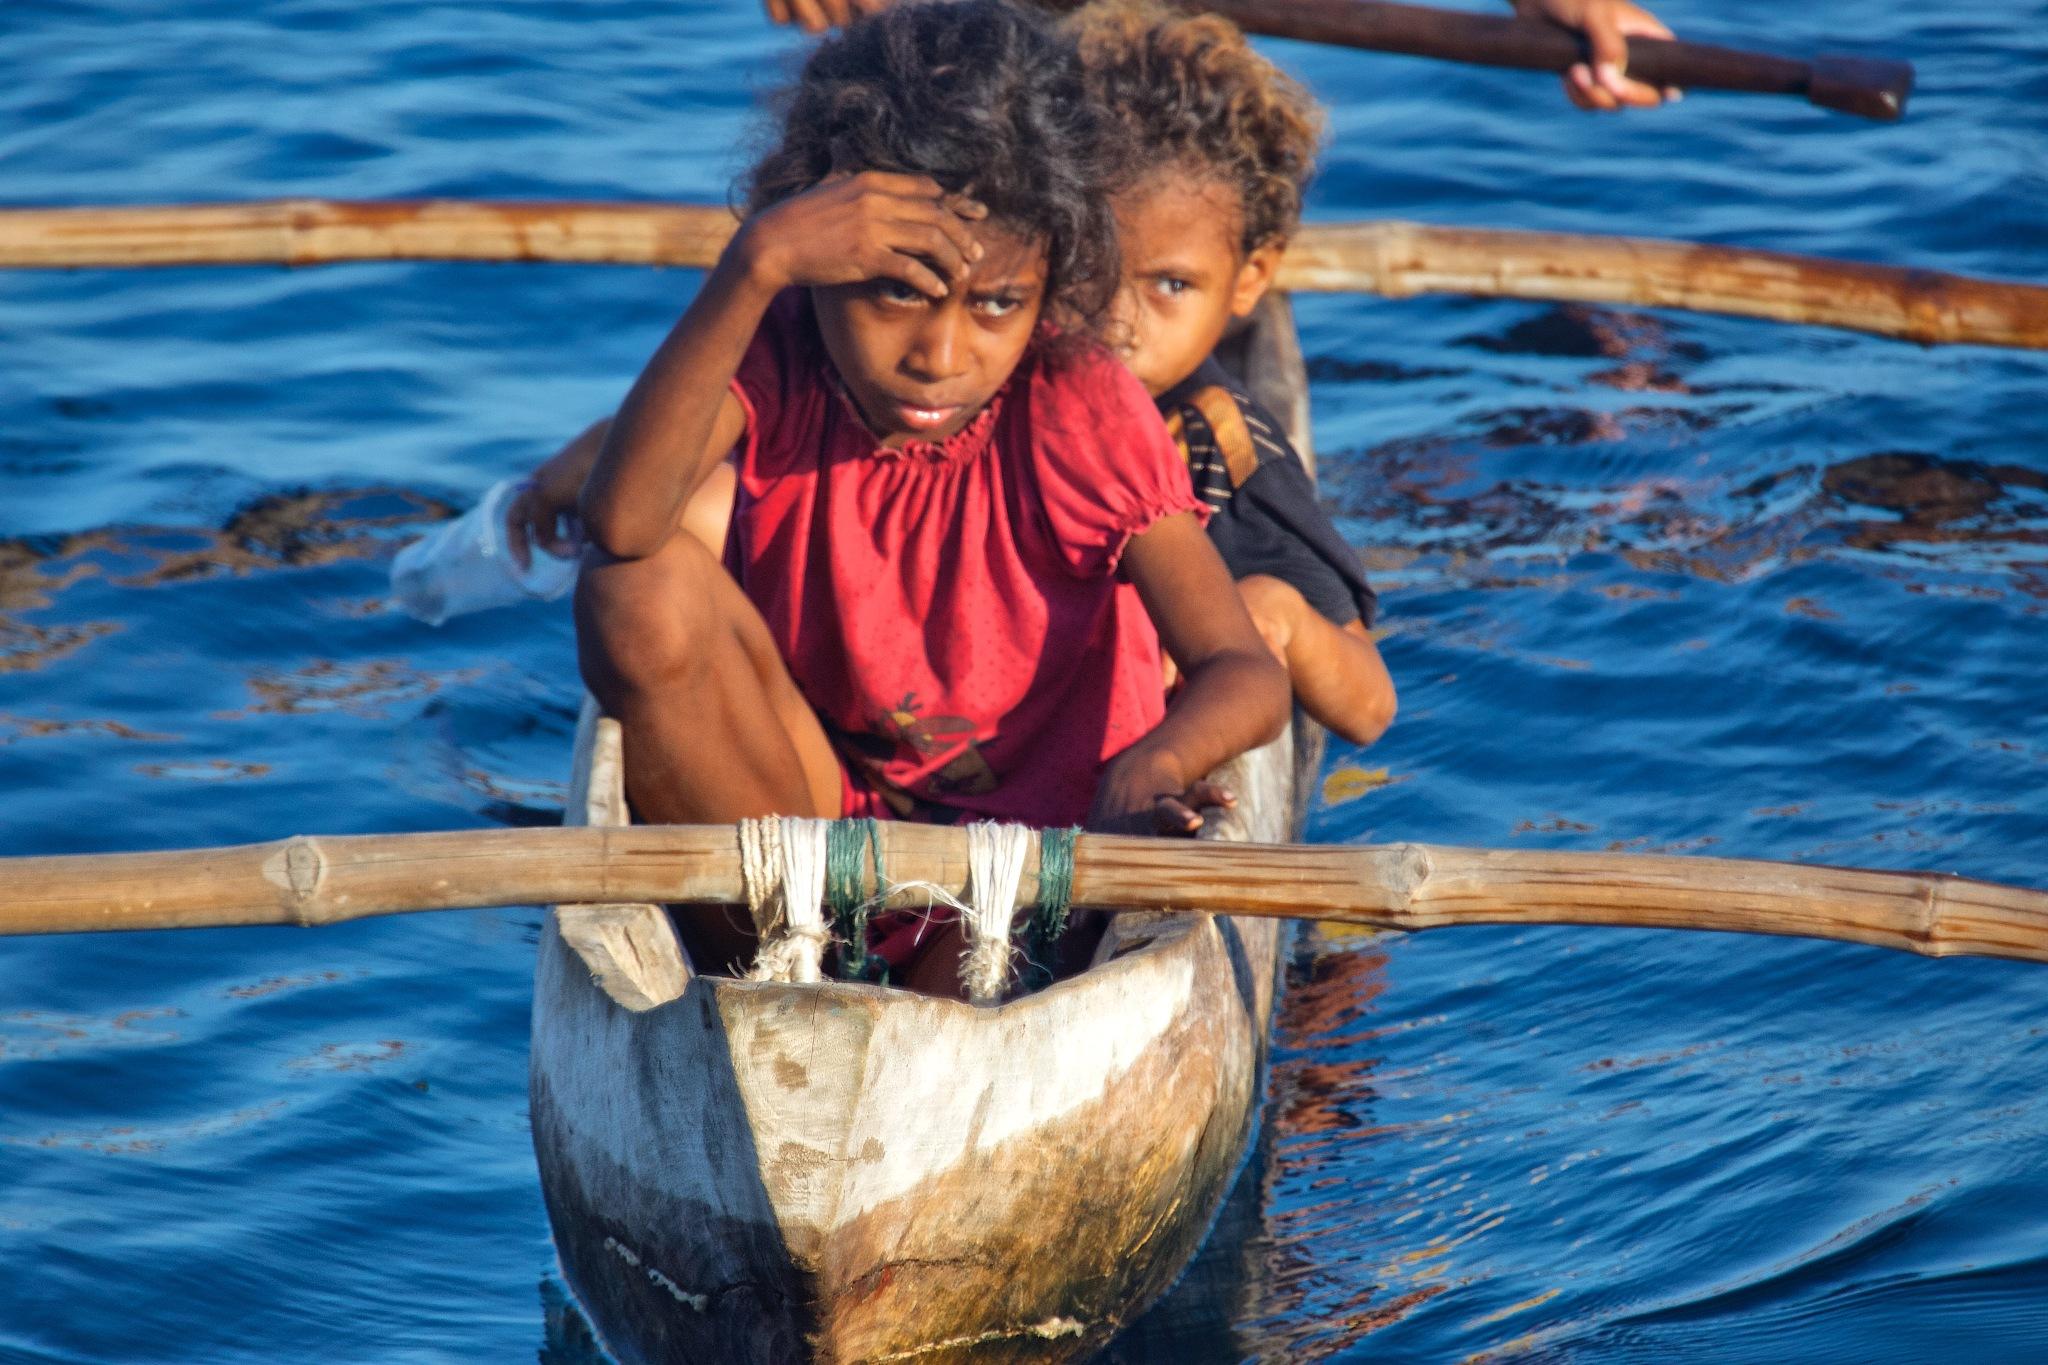 Children living under the volcano (series) by Tom K